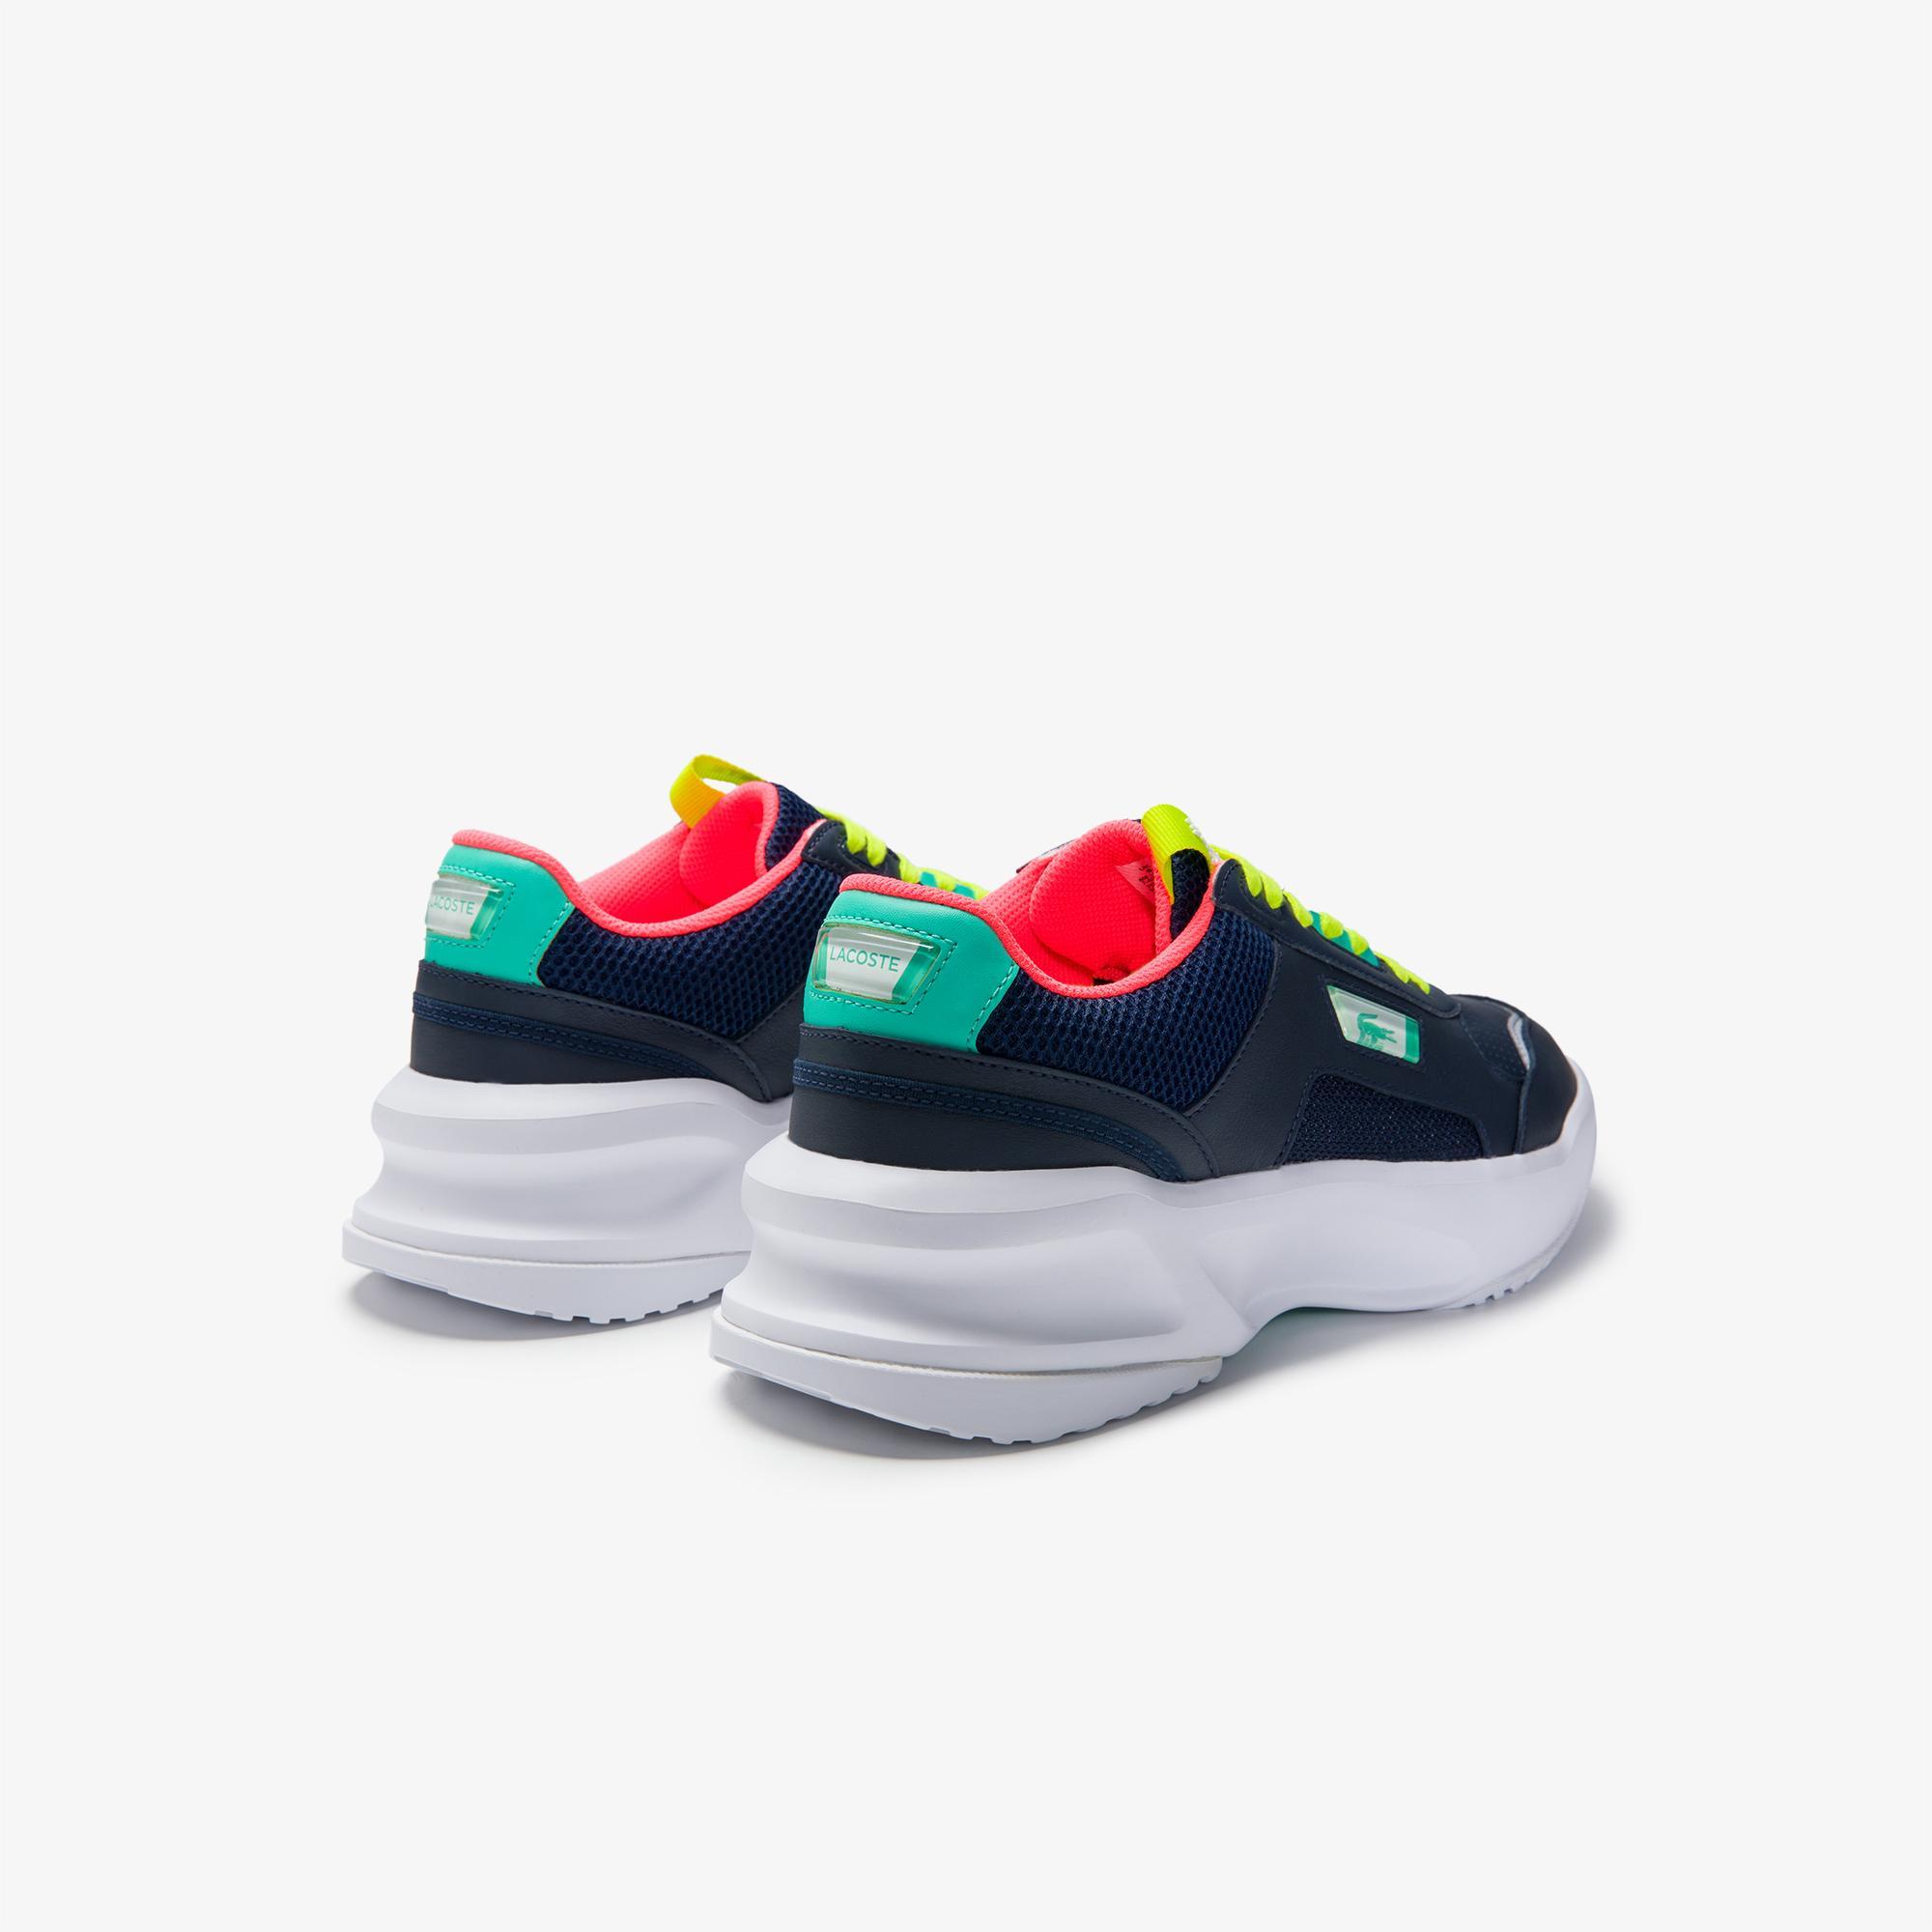 Lacoste Ace Lift 0120 1 Sma Erkek Deri Lacivert - Turkuaz Sneaker